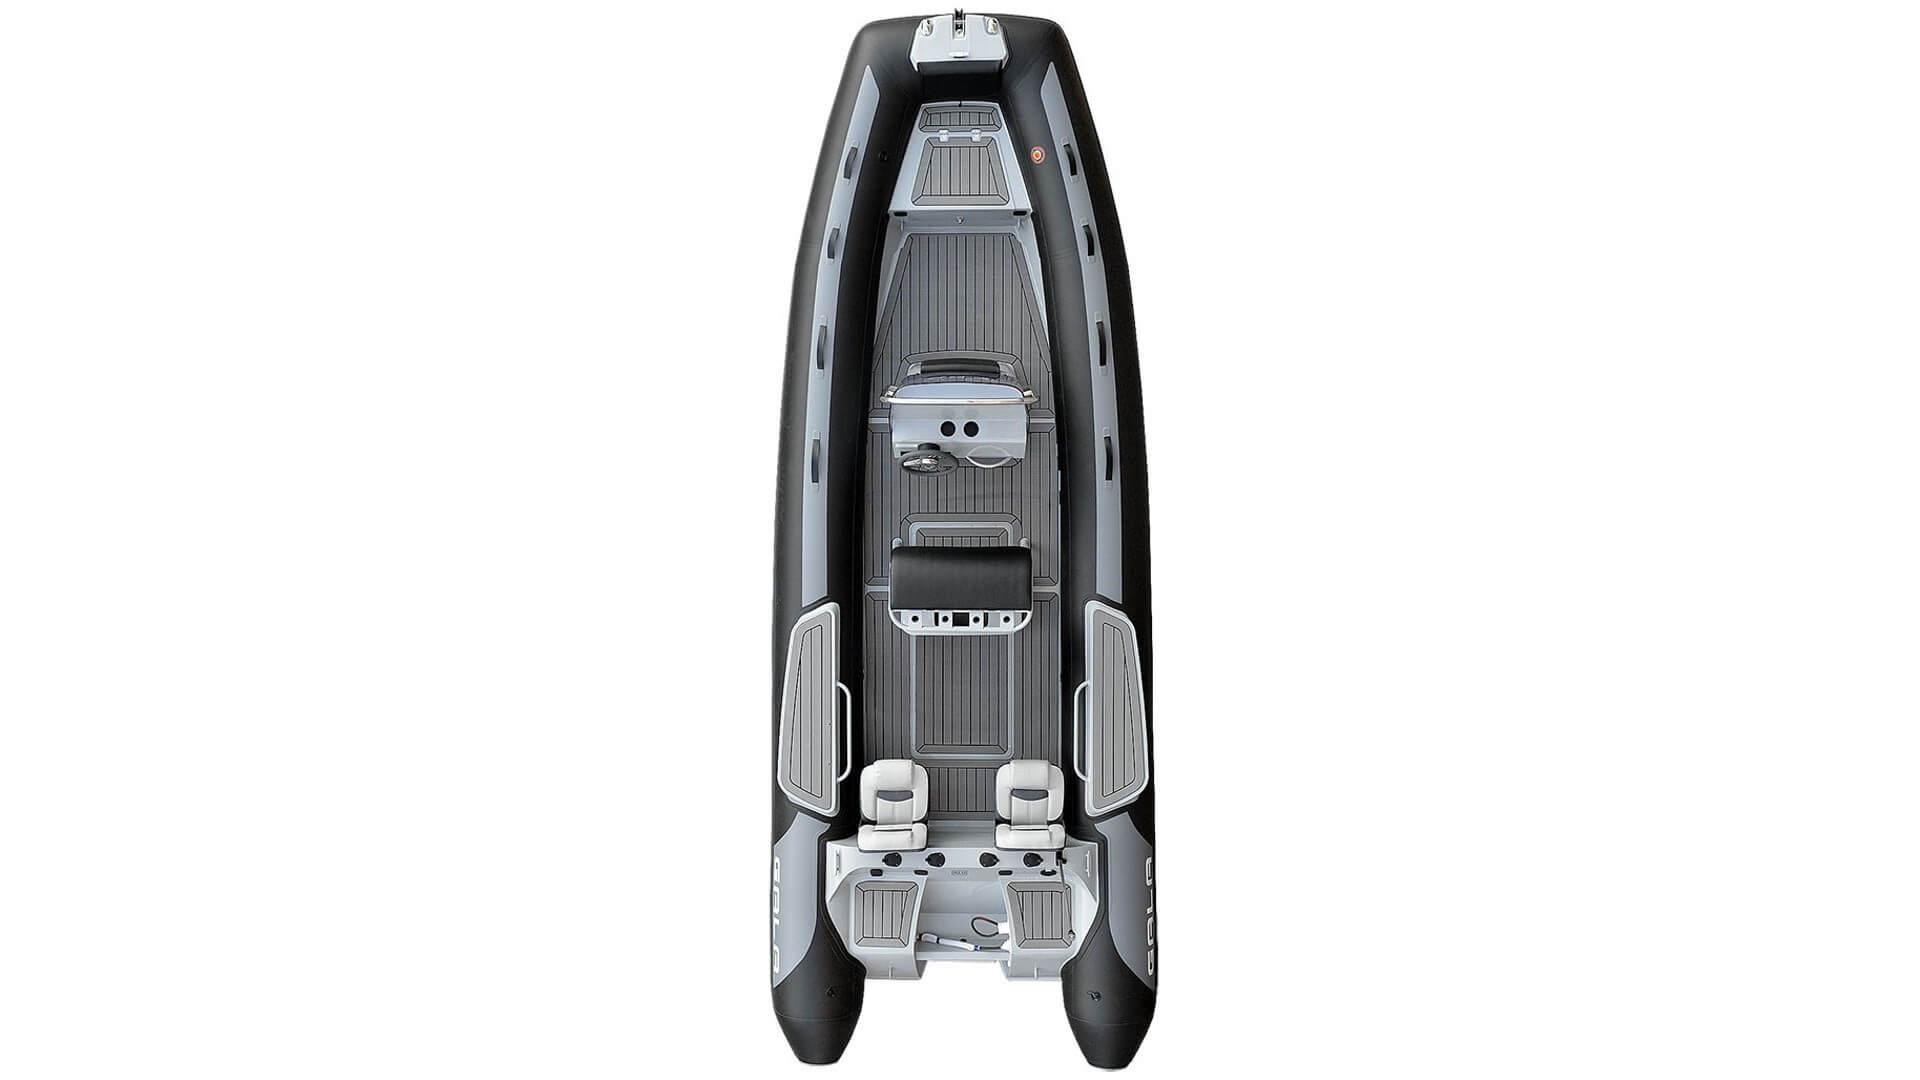 Надувная лодка с жестким алюминиевым дном GALA Viking V650F, Надувная лодка с жестким дном GALA Viking V650F, Надувная лодка с жестким дном GALA V650F, Надувная лодка GALA V650F, Надувная лодка GALA V650F, GALA V650F, лодка с жестким дном, алюминиевый риб, алюминиевый RIB, RIB